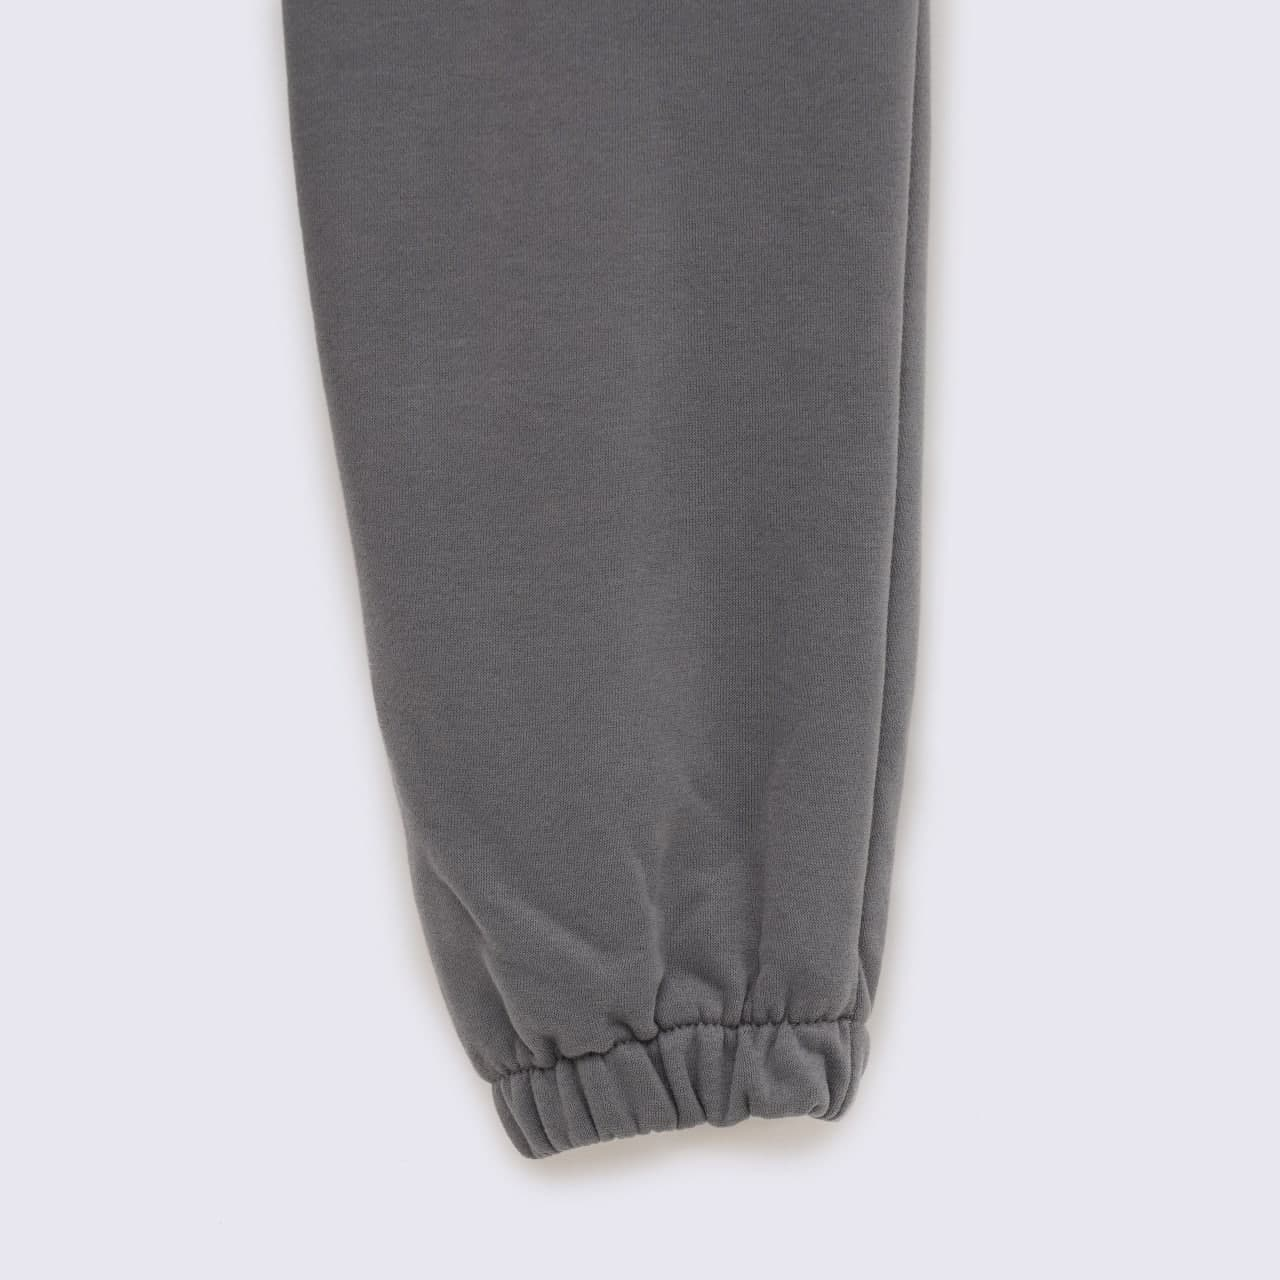 Спортивные штаны South basik gray - фото 5